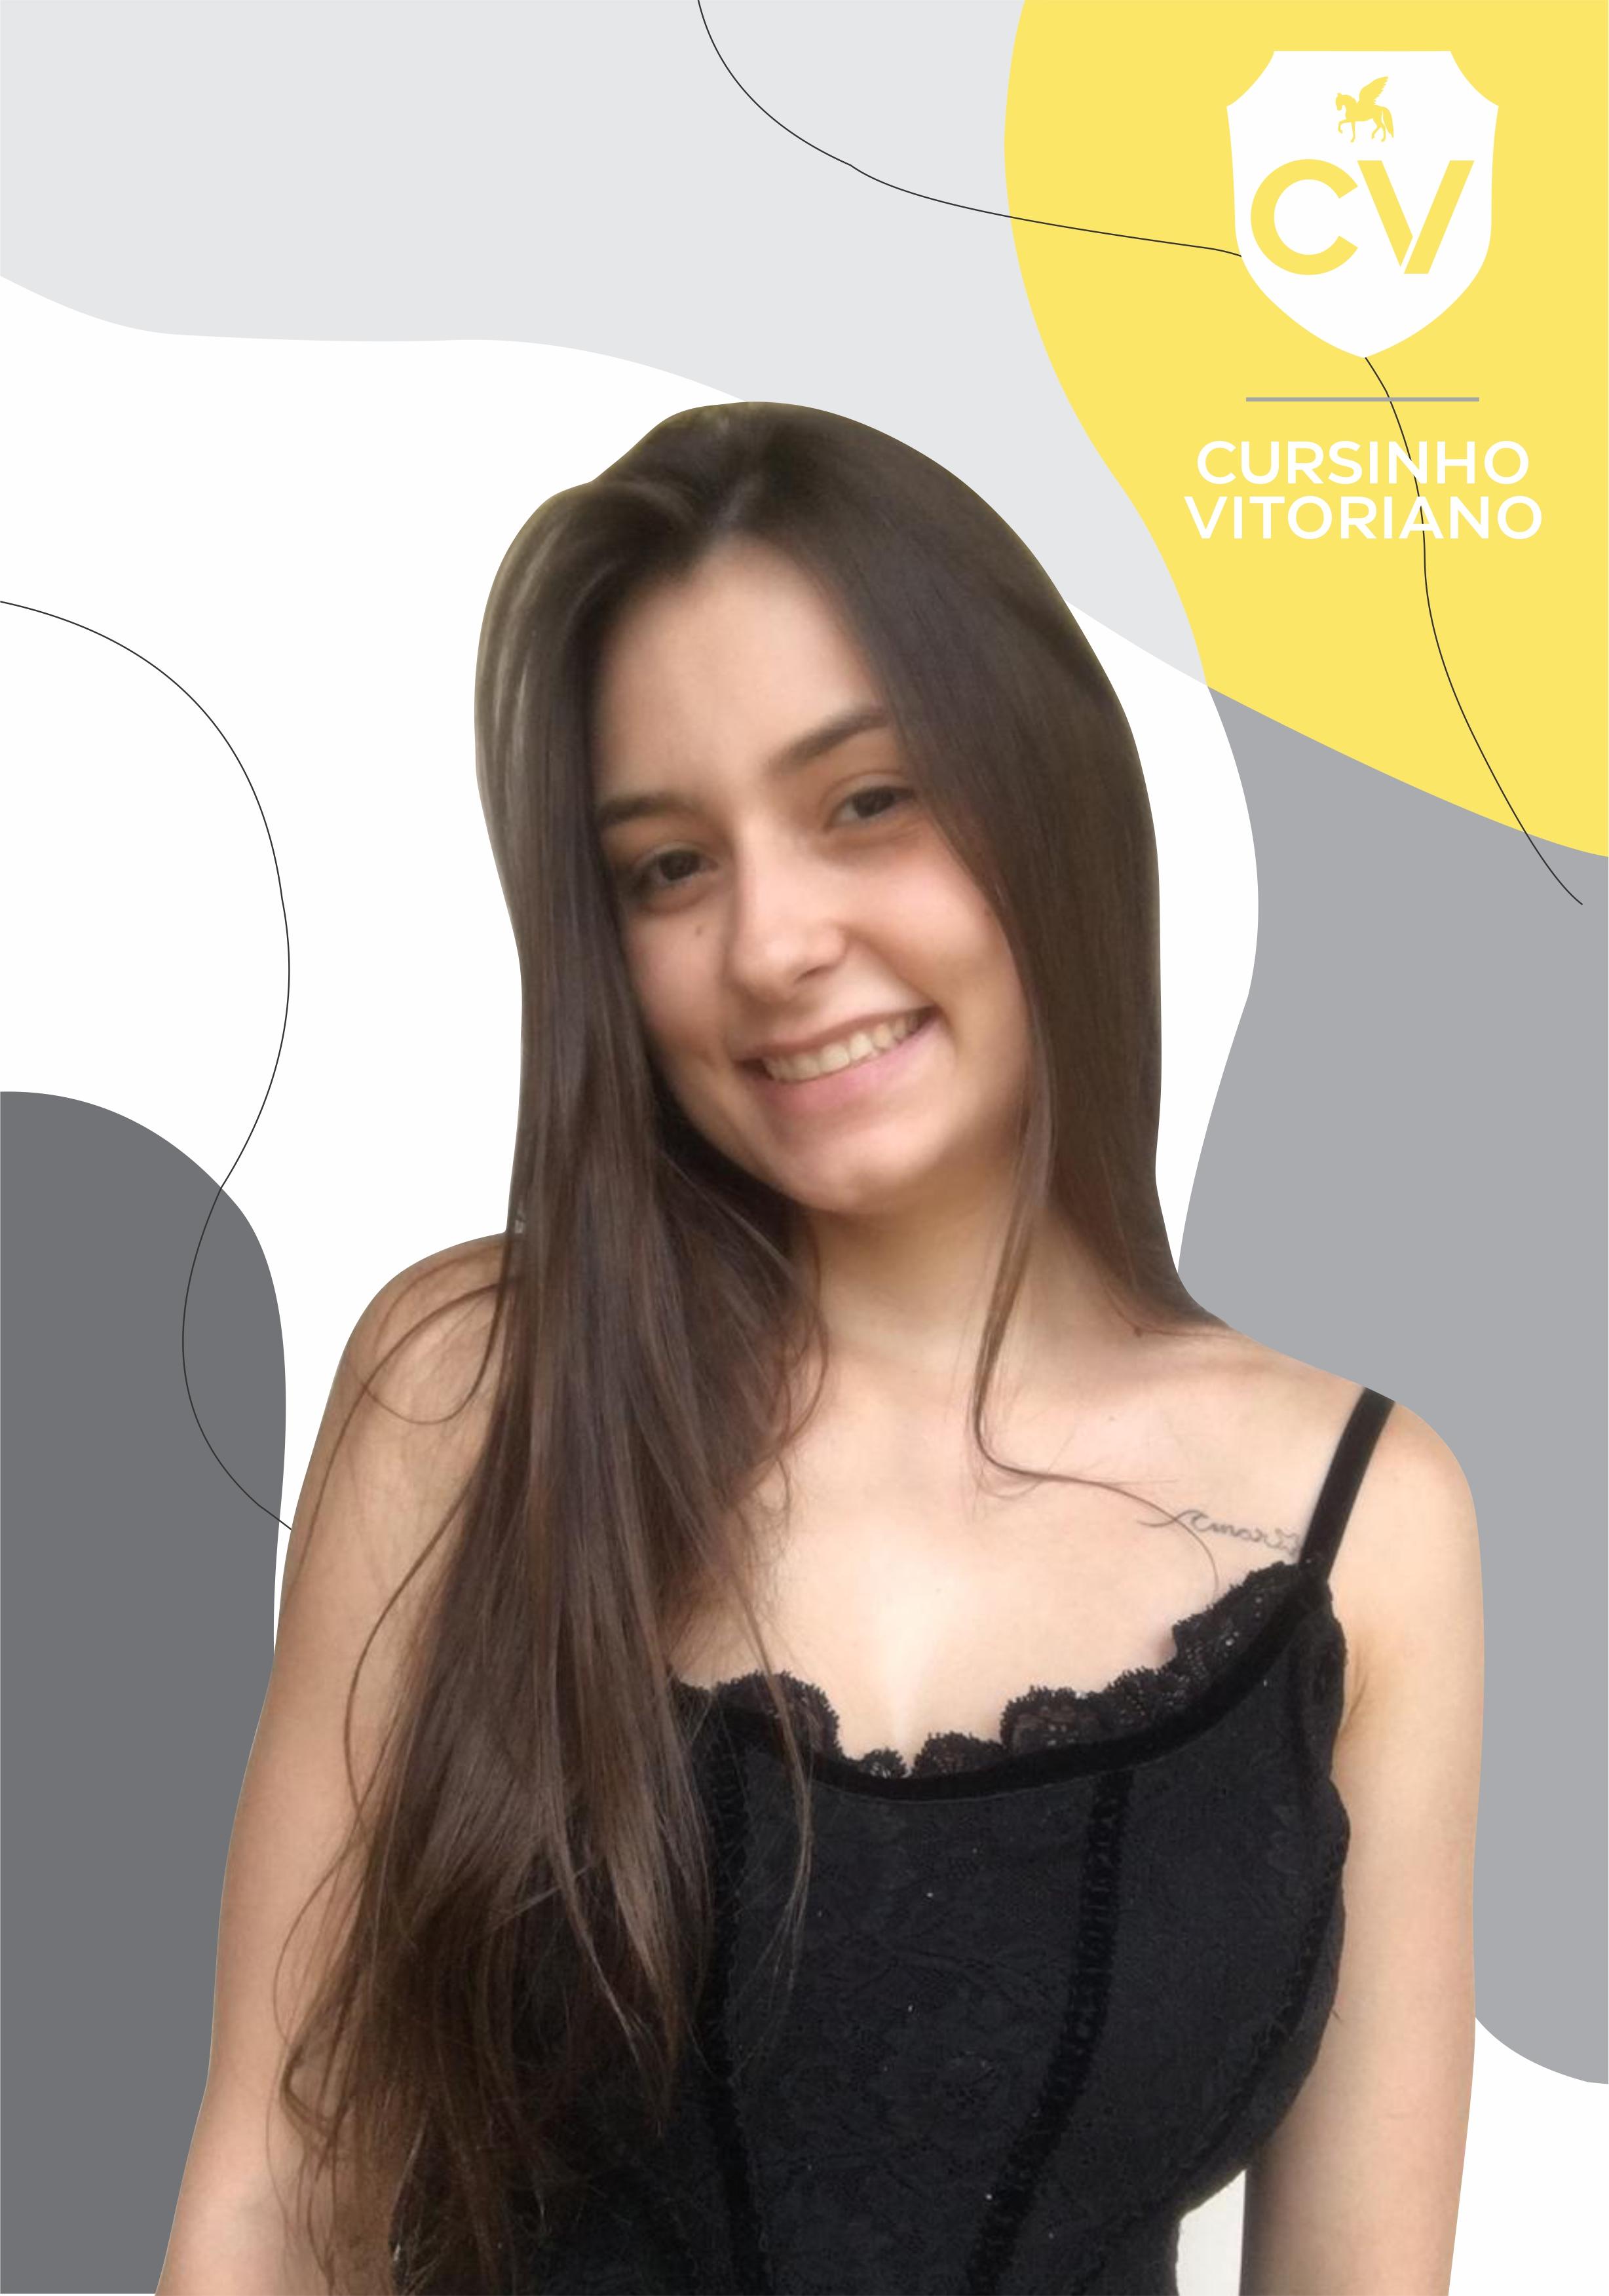 Isabelle Cardoso Alves De Lima